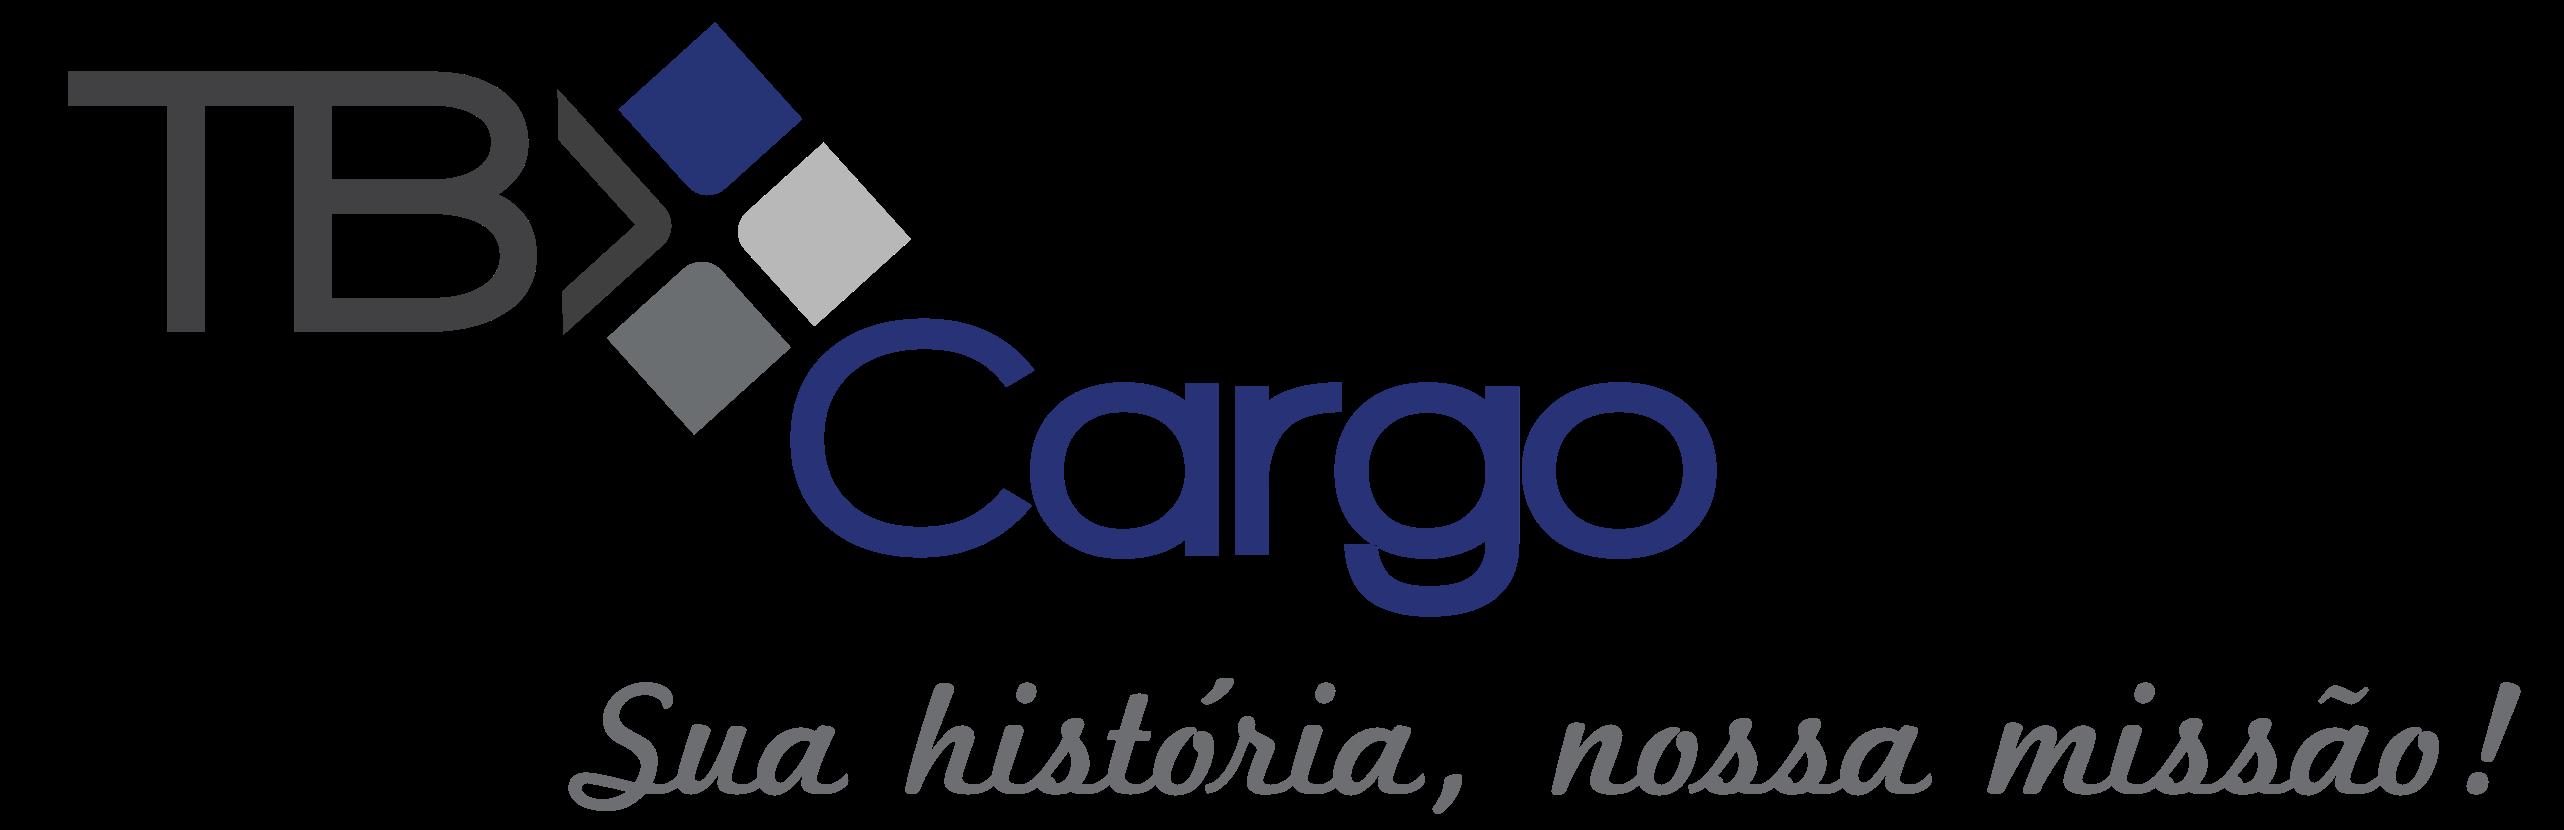 TB Cargo